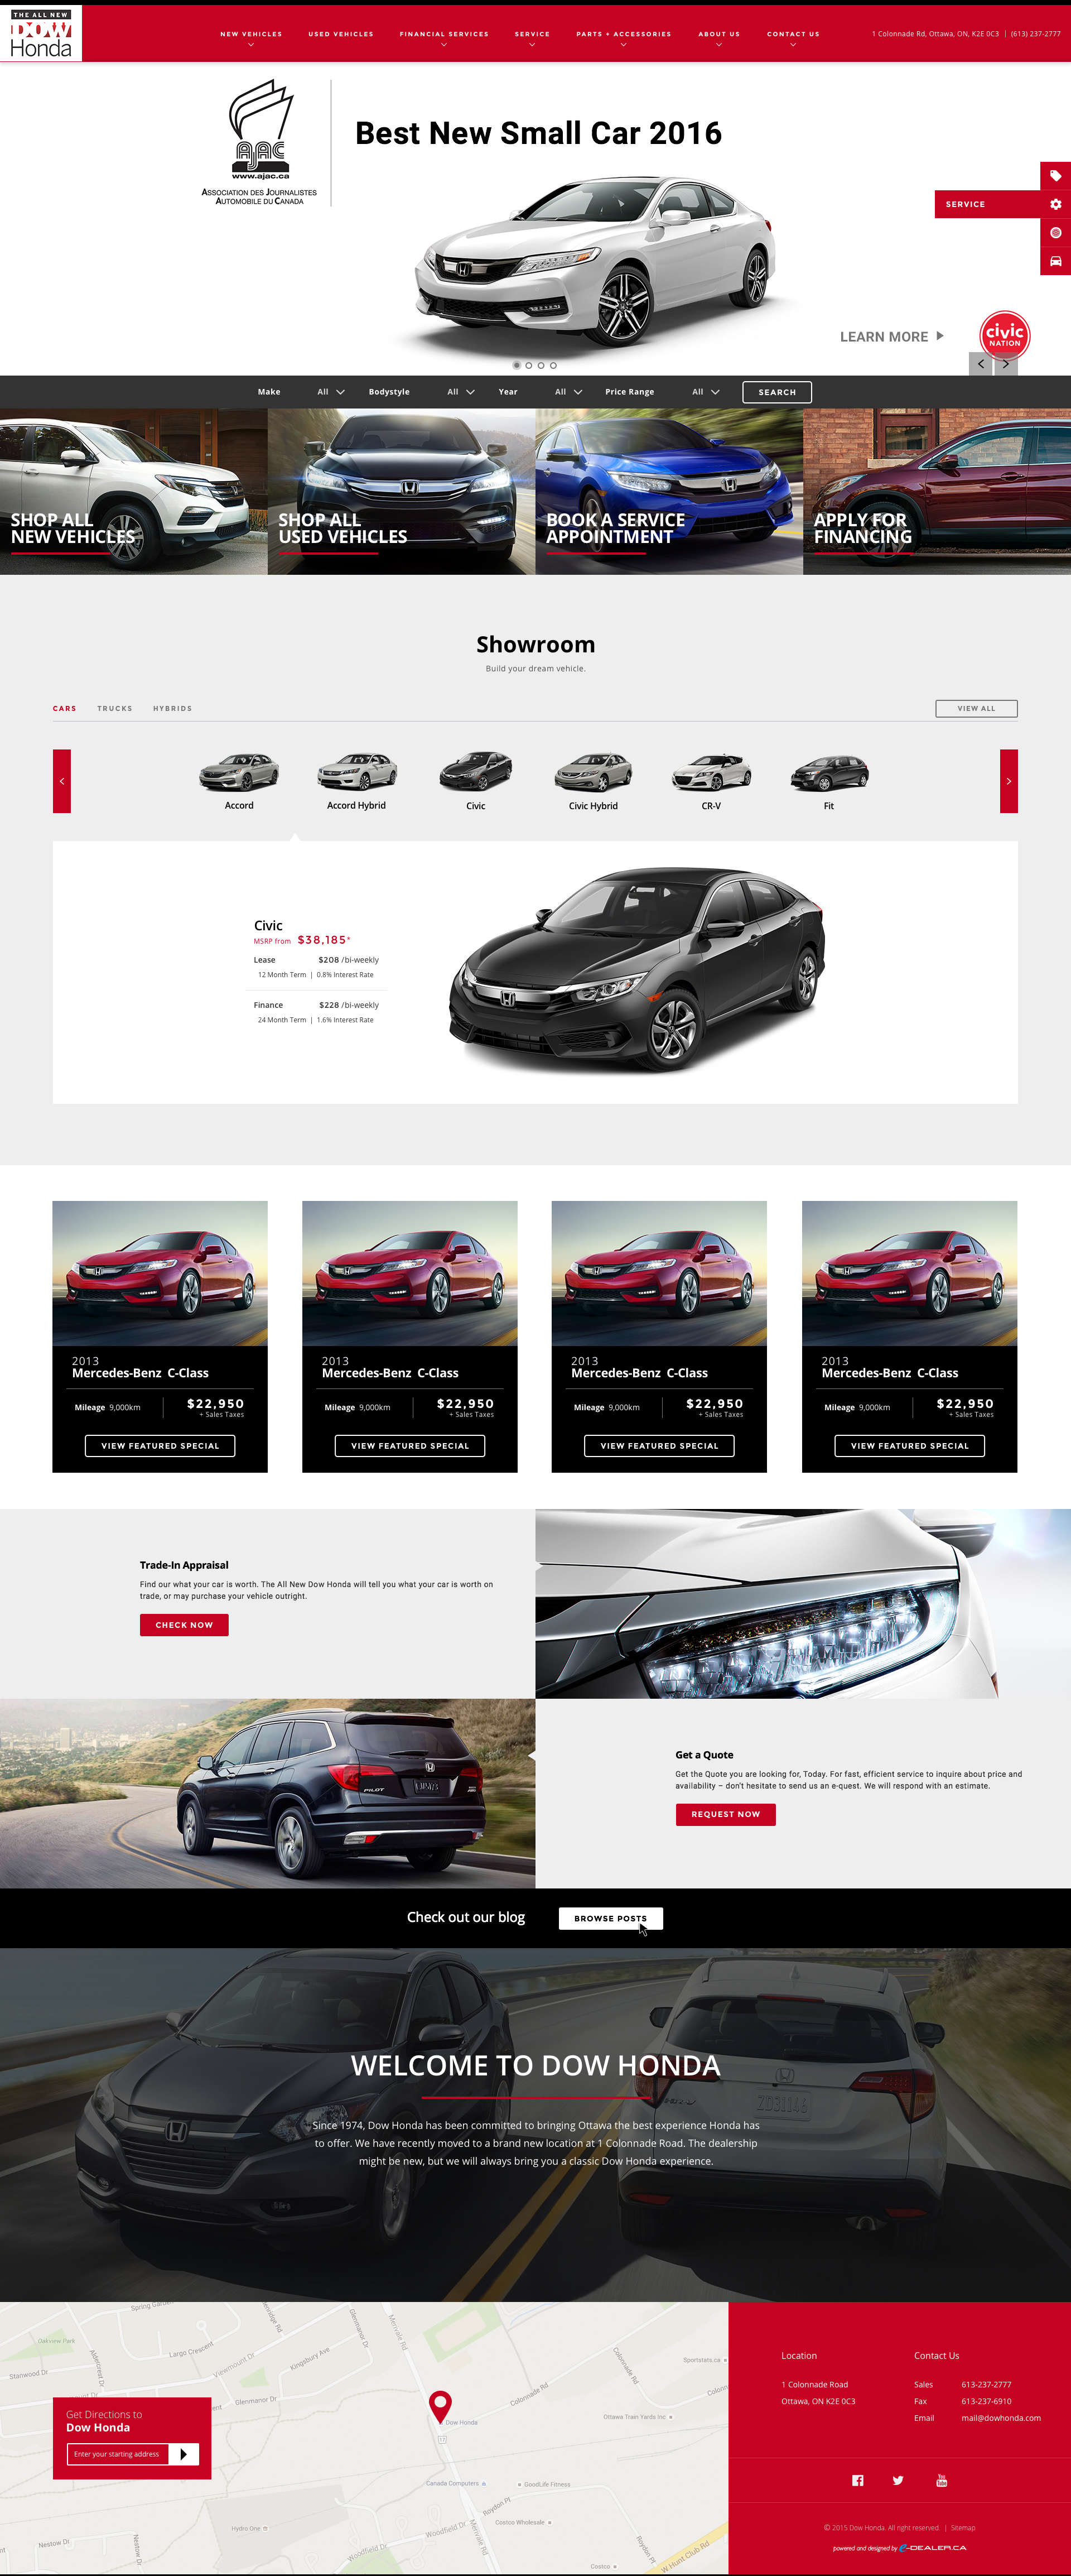 DowHonda-Design-FInal